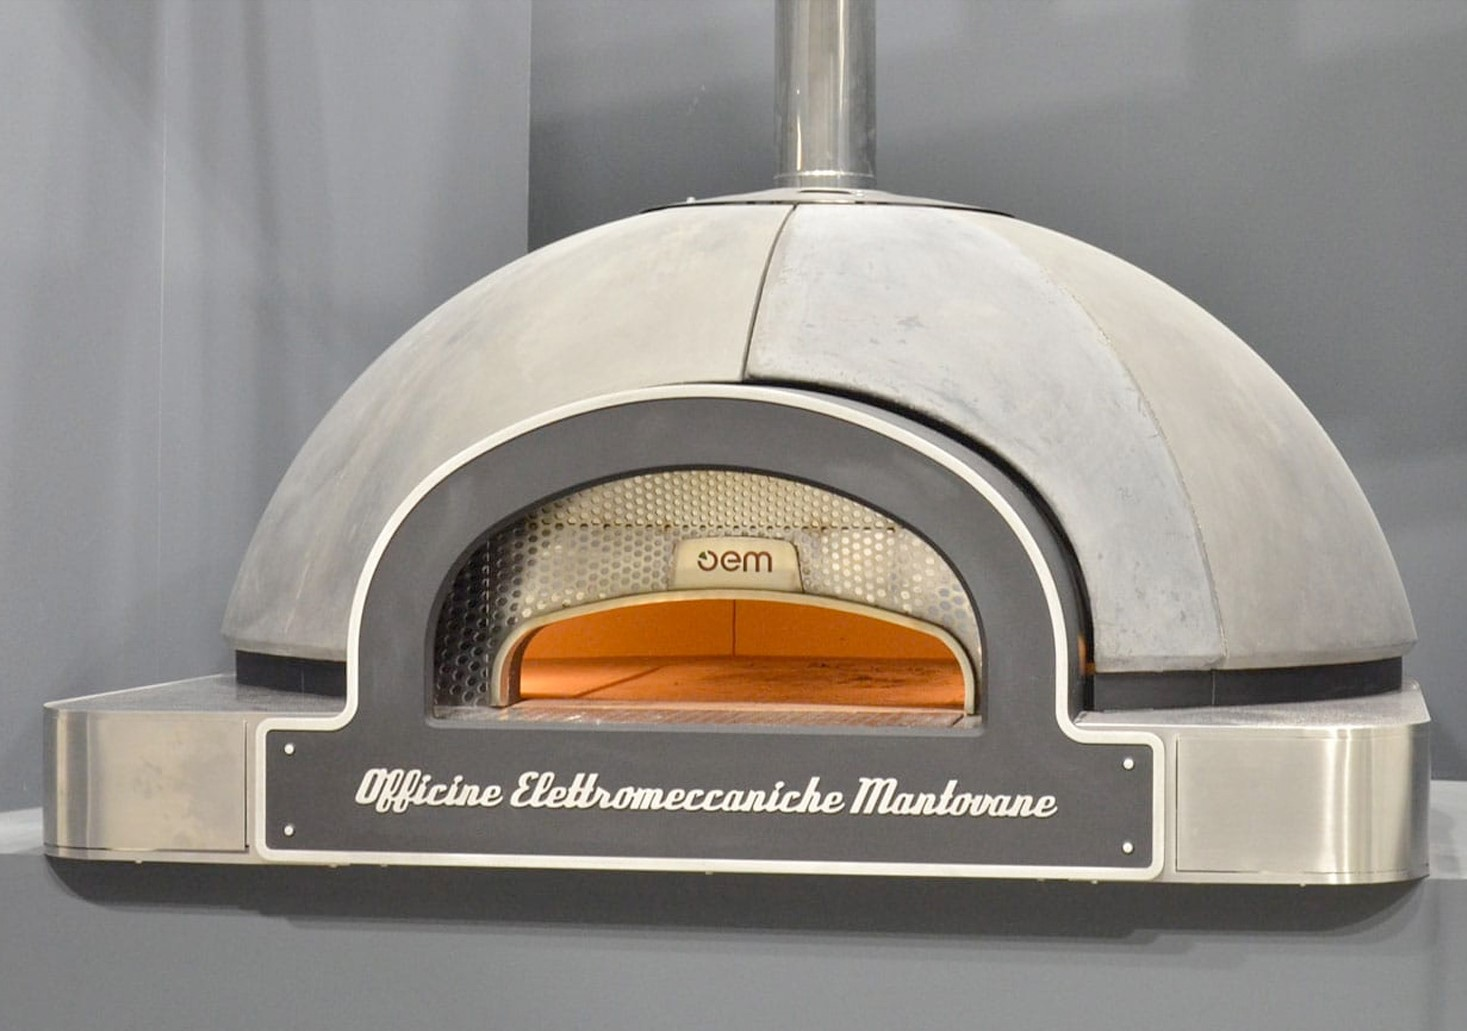 Metos Dome kuputyyppinen pizzauuni